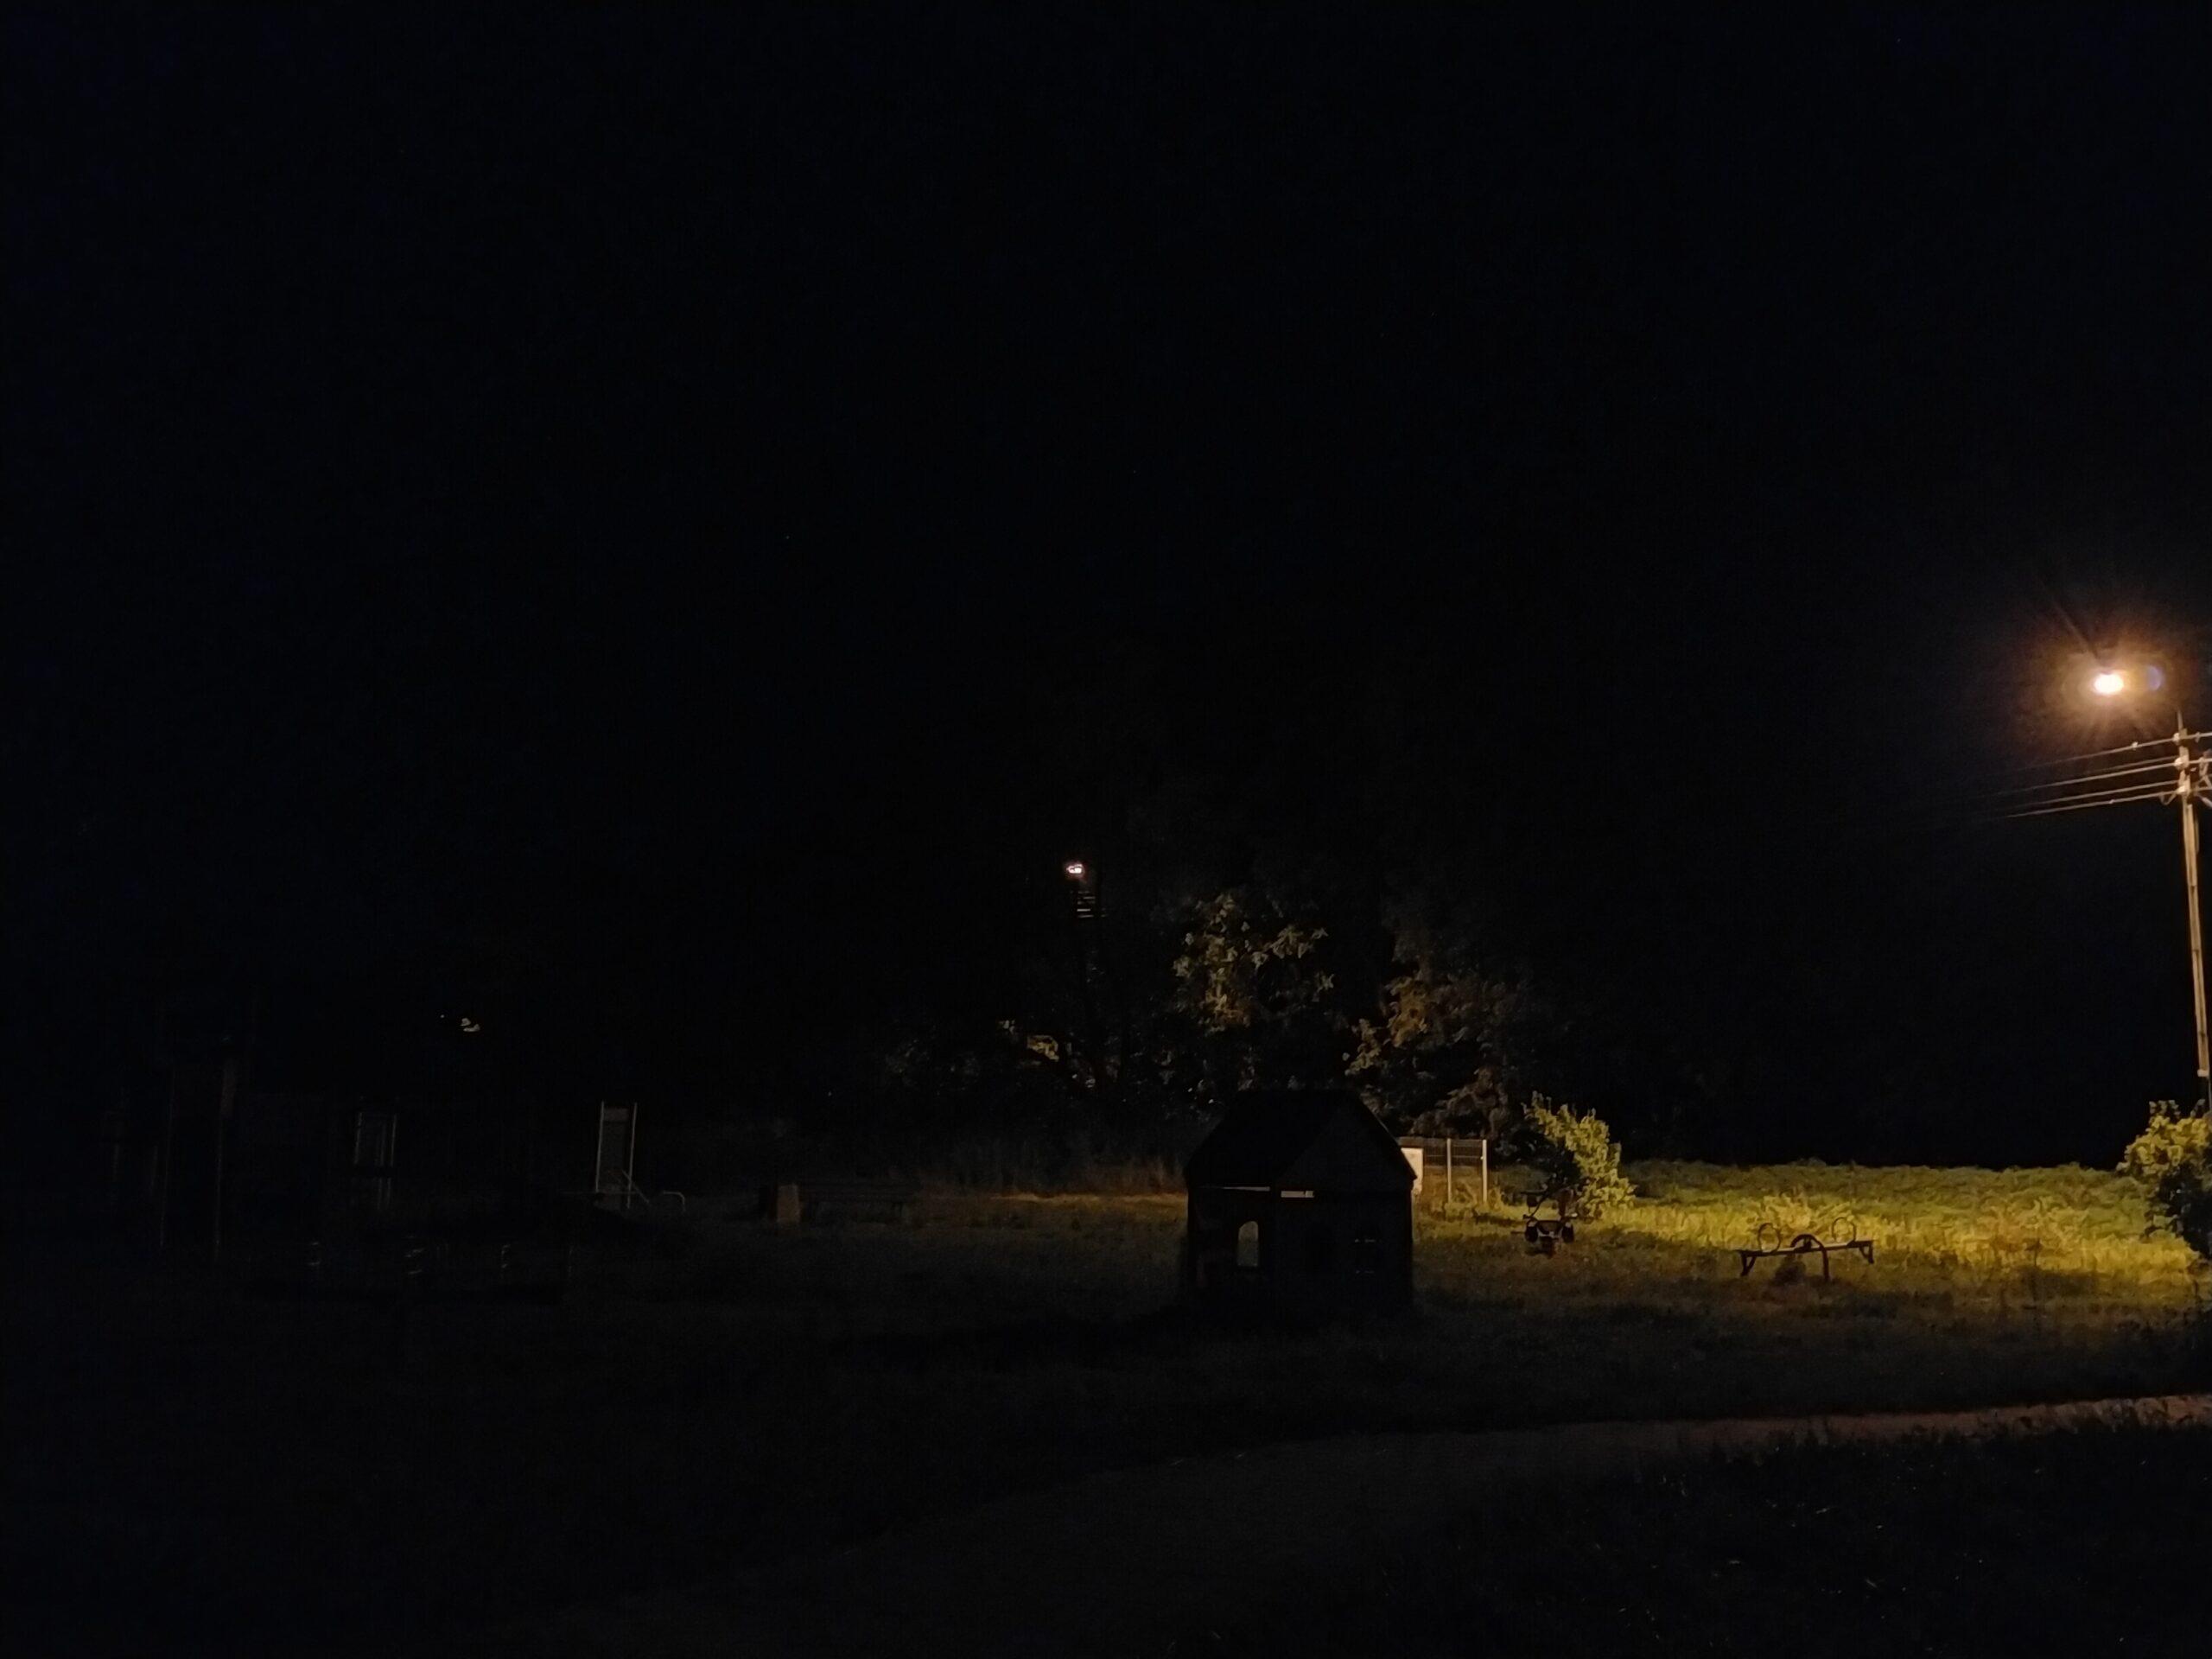 OPPO A72 - main109 - Night